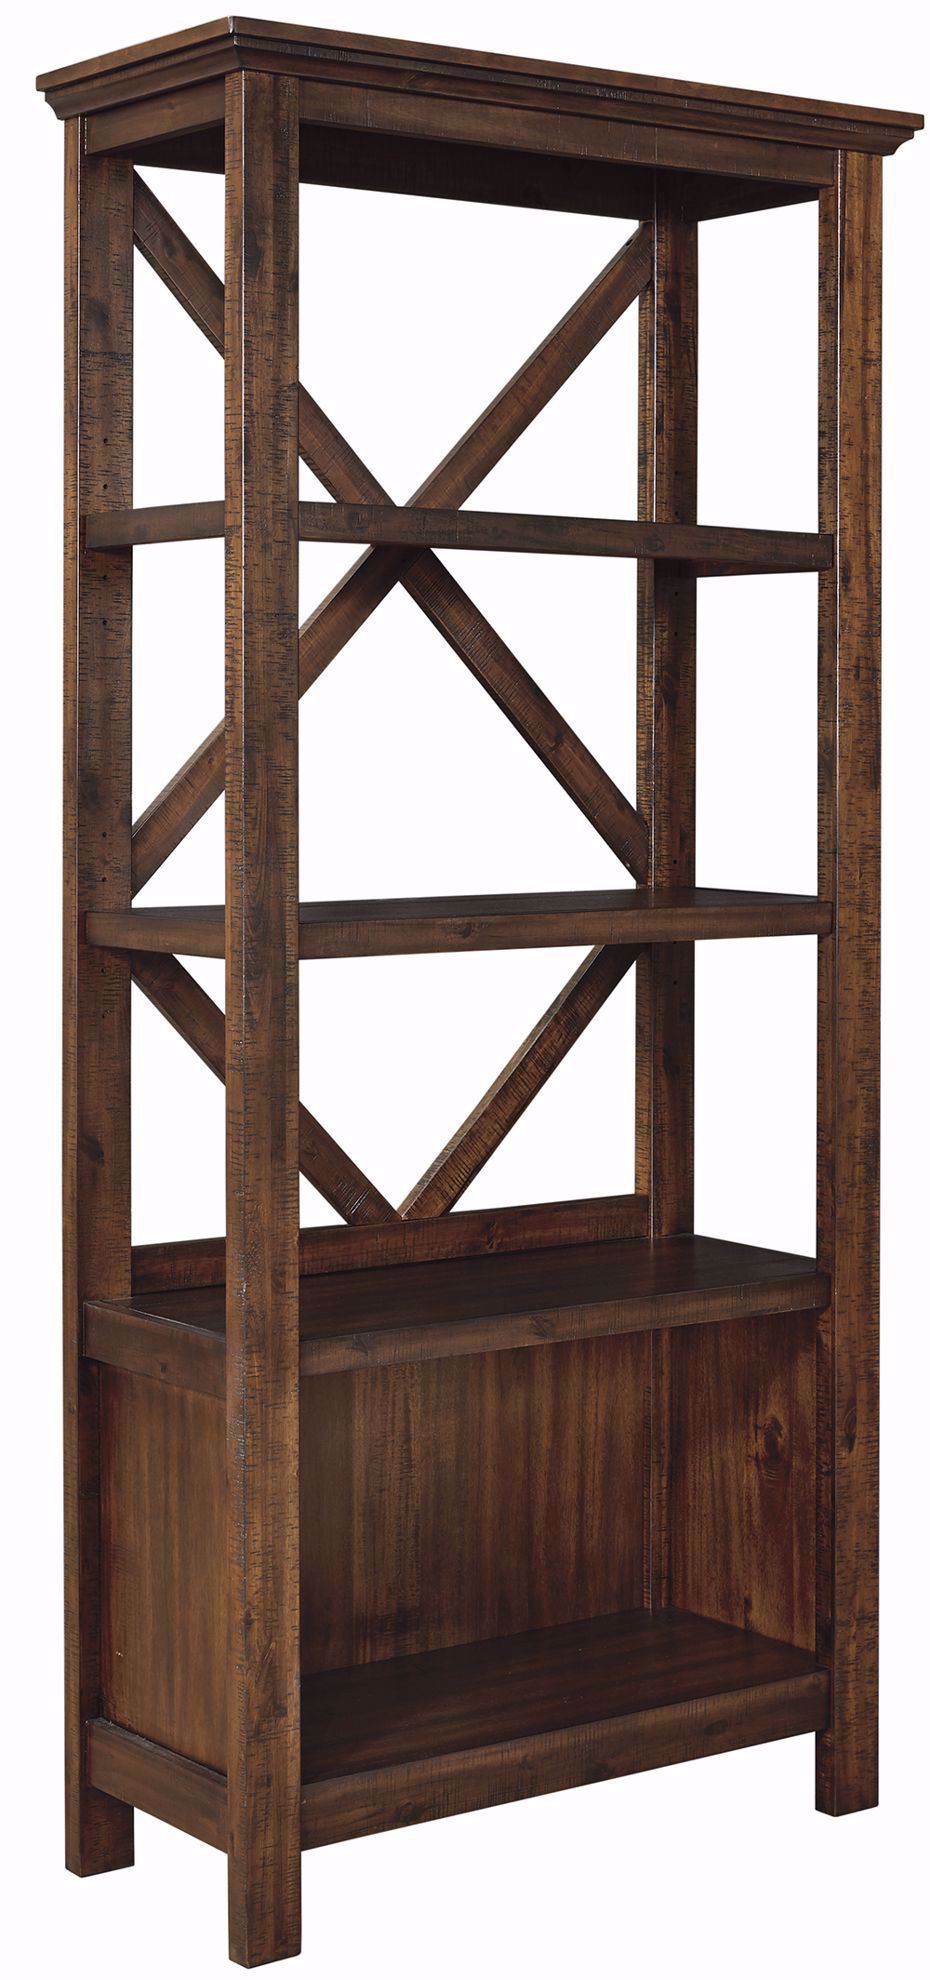 Picture of Baldridge Large Bookcase